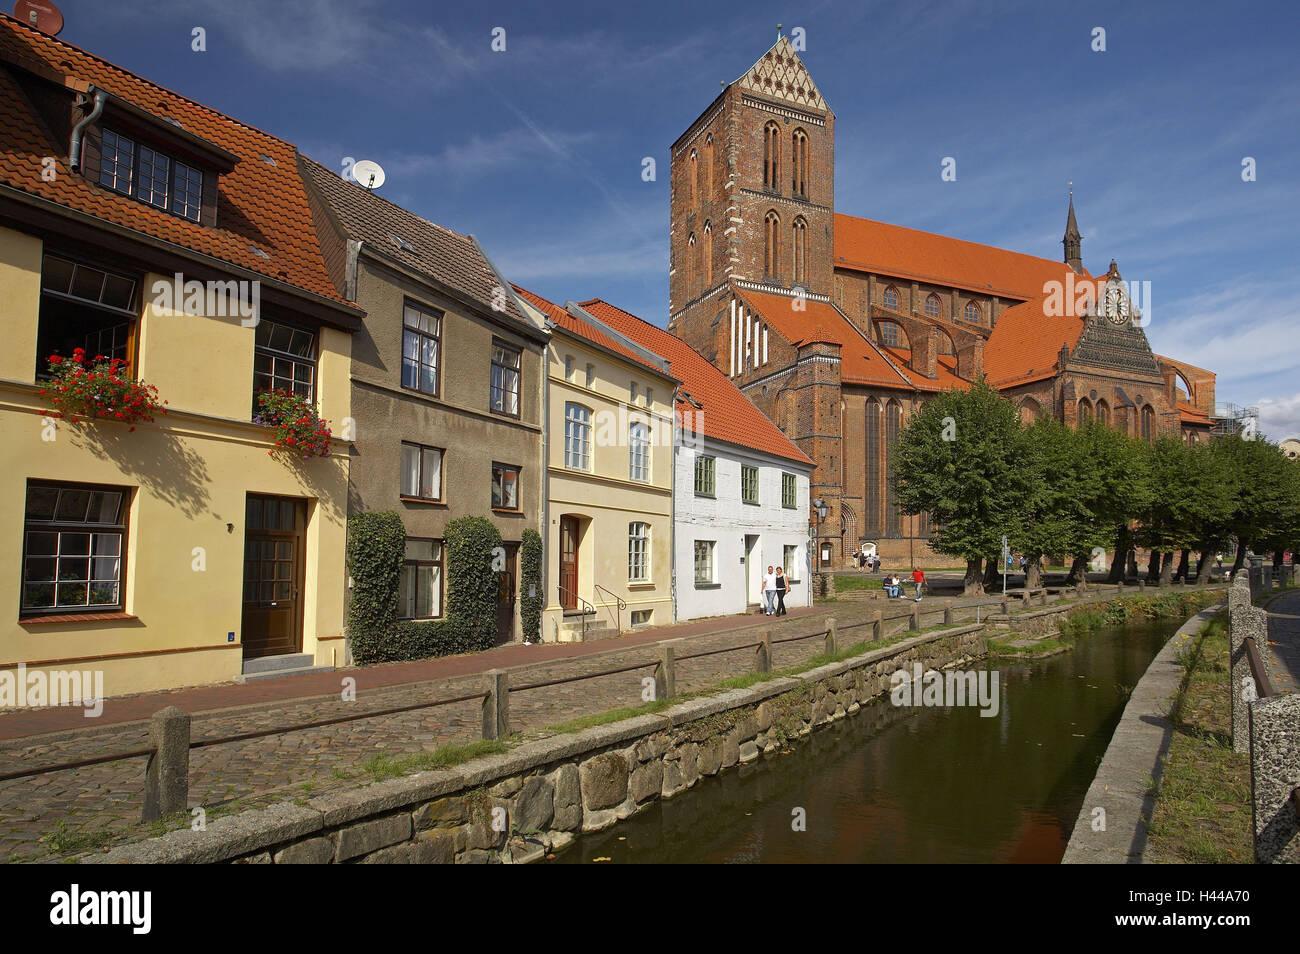 Germany, Mecklenburg-West Pomerania, Wismar, Saint Nikolai church, mill brook channel, - Stock Image